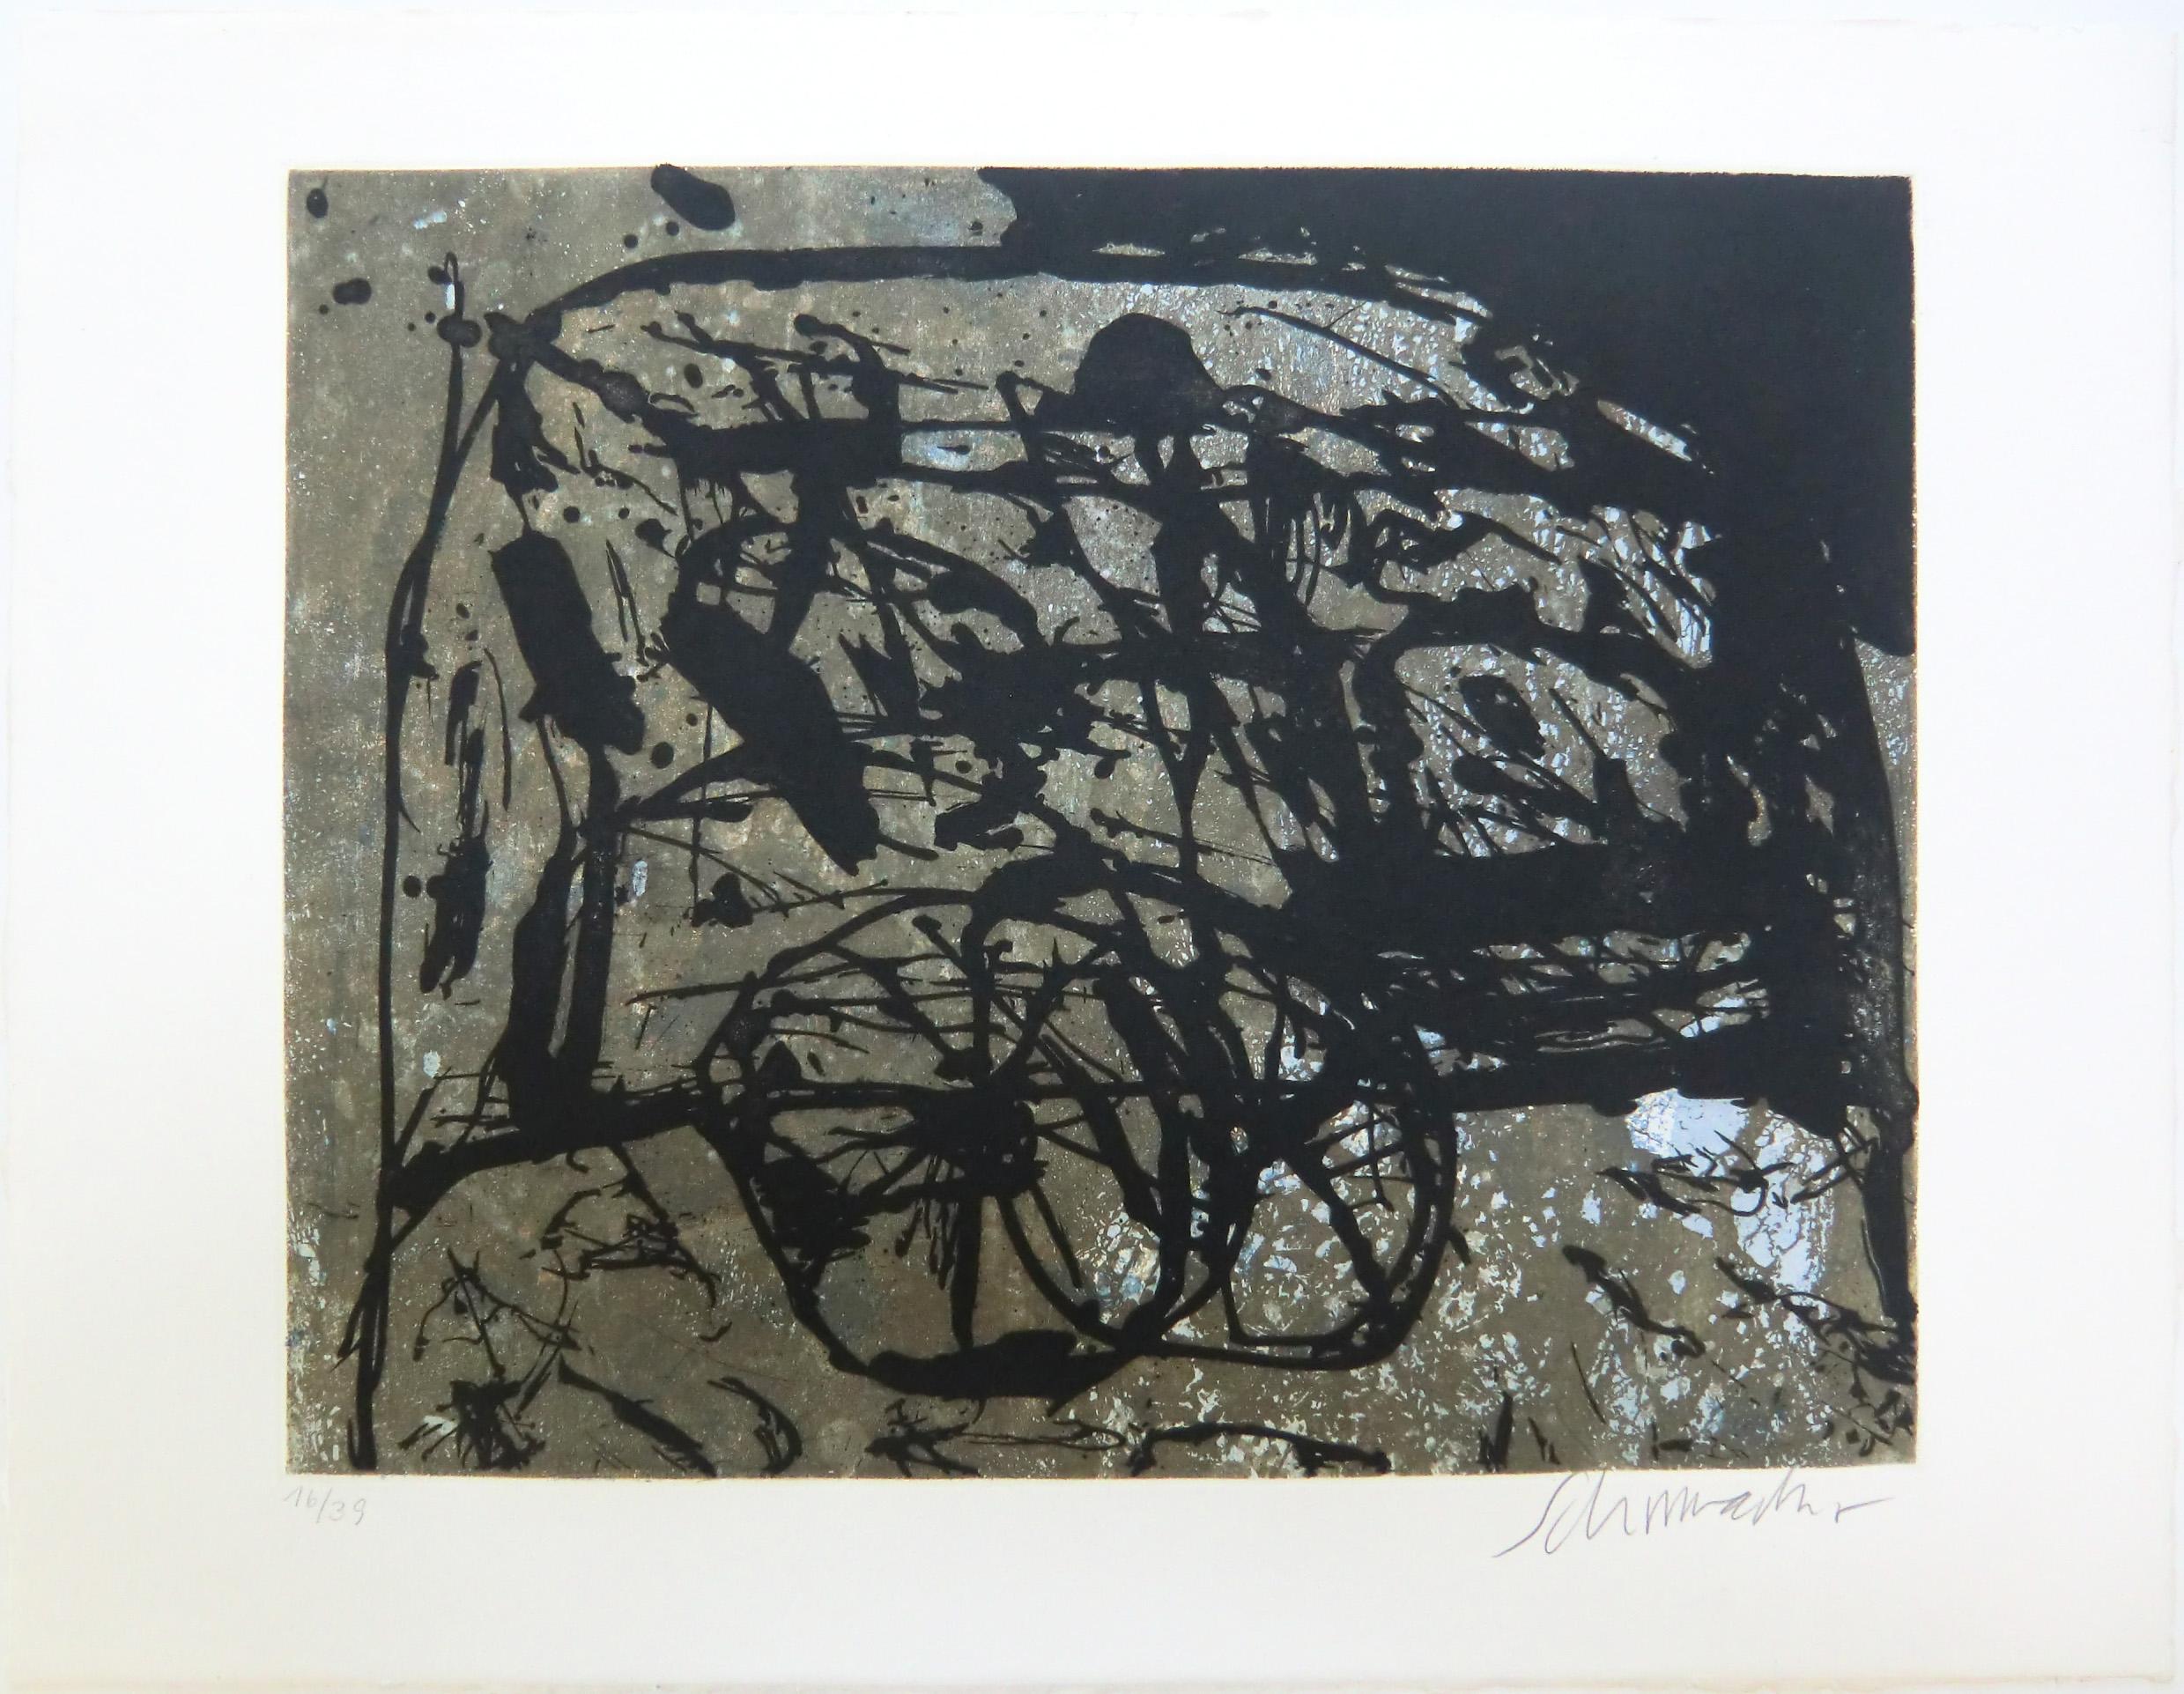 Emil Schumacher Grafik 13-1990